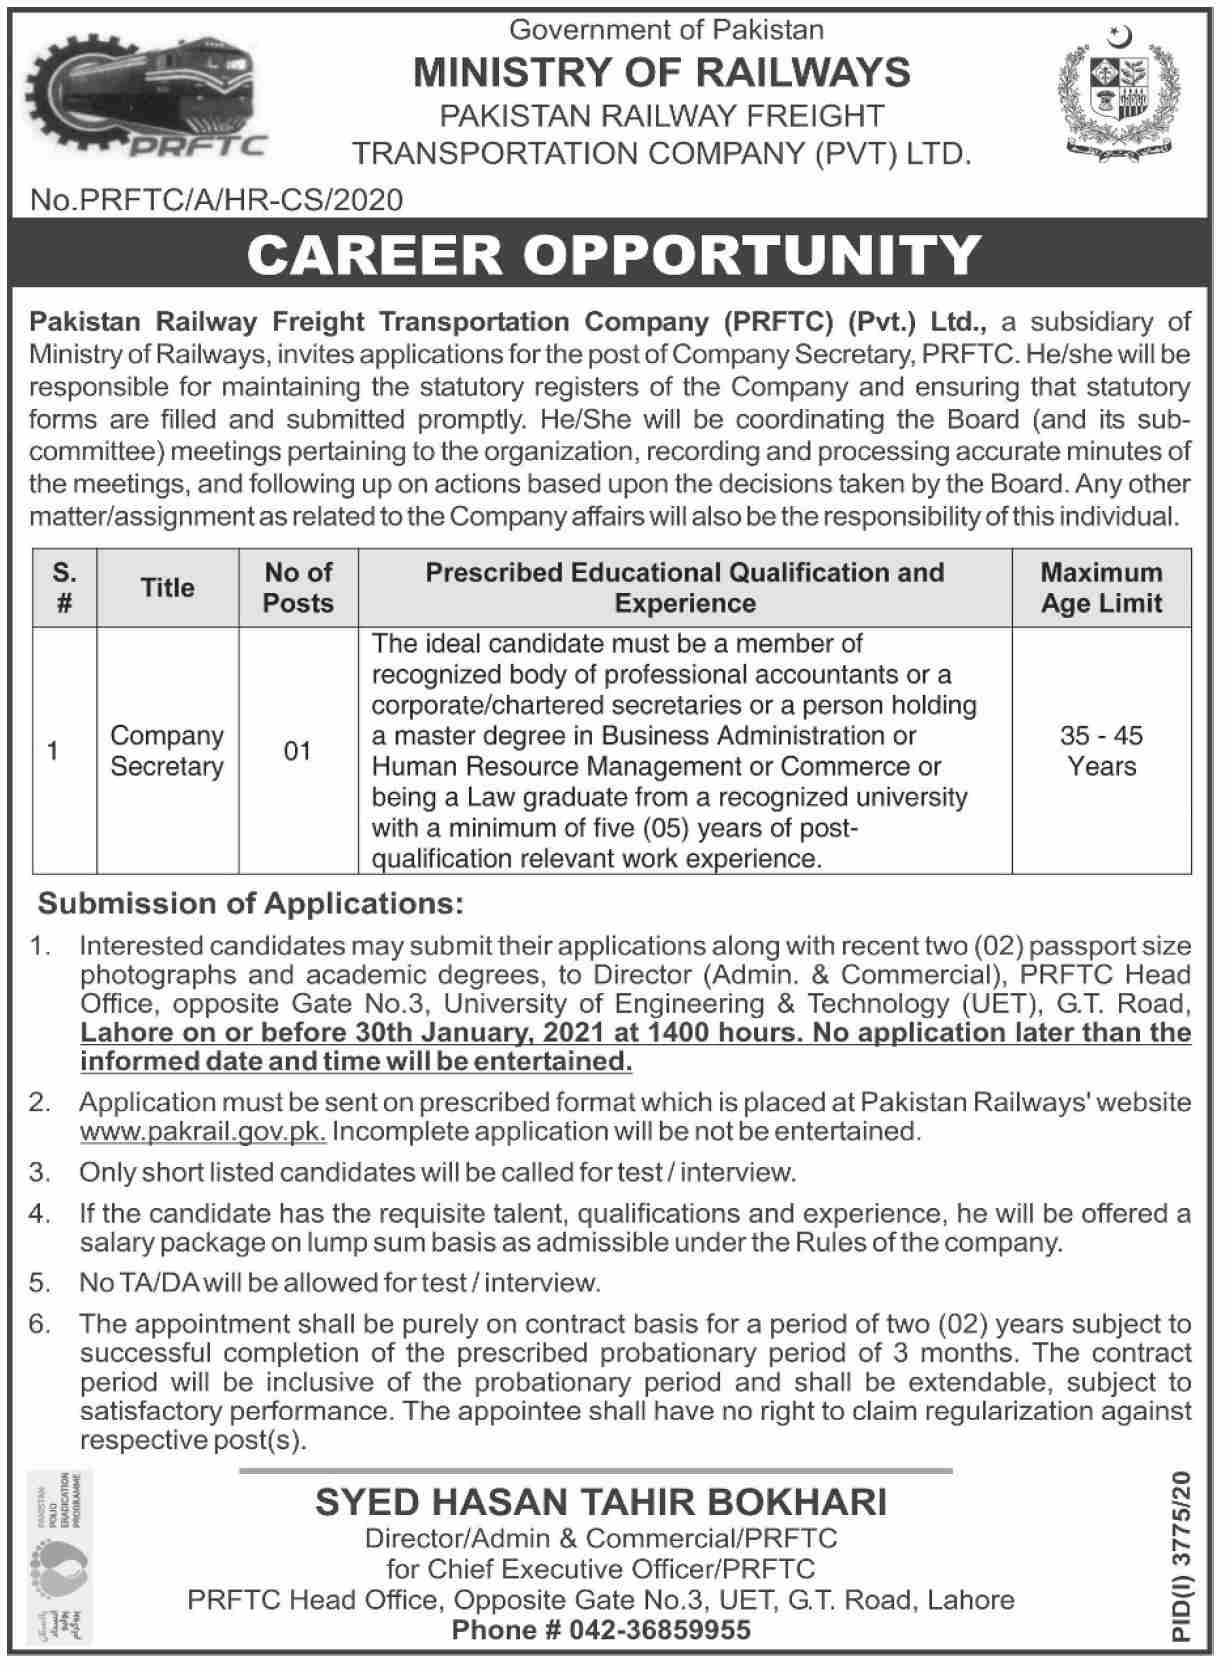 Railway Jobs - Railway Career - Latest Railway Jobs - How Do I Get a Job on The Railway - Pakistan Railway Freight Transportation Company PRFTC Jobs 2021